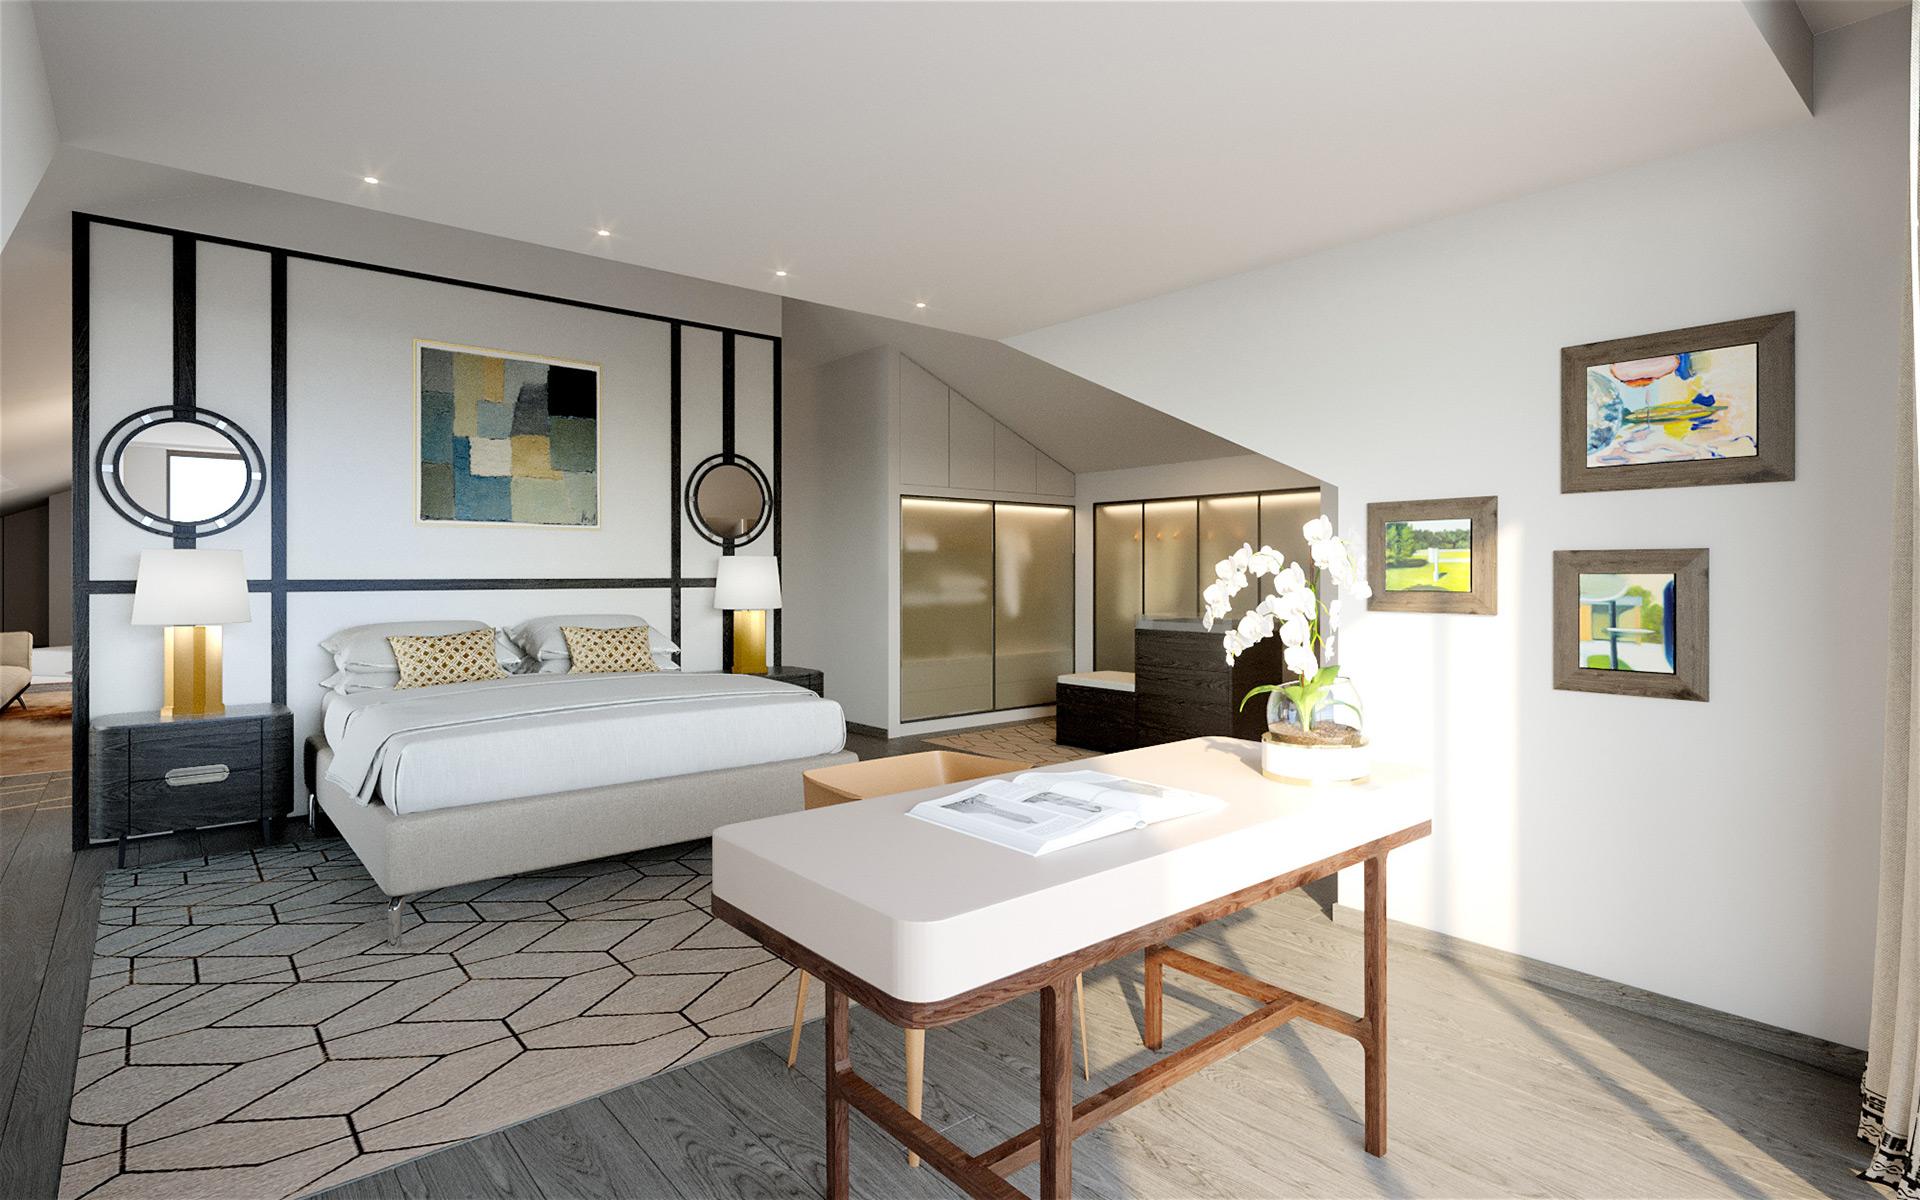 3D Photo of a room for villa real estate development